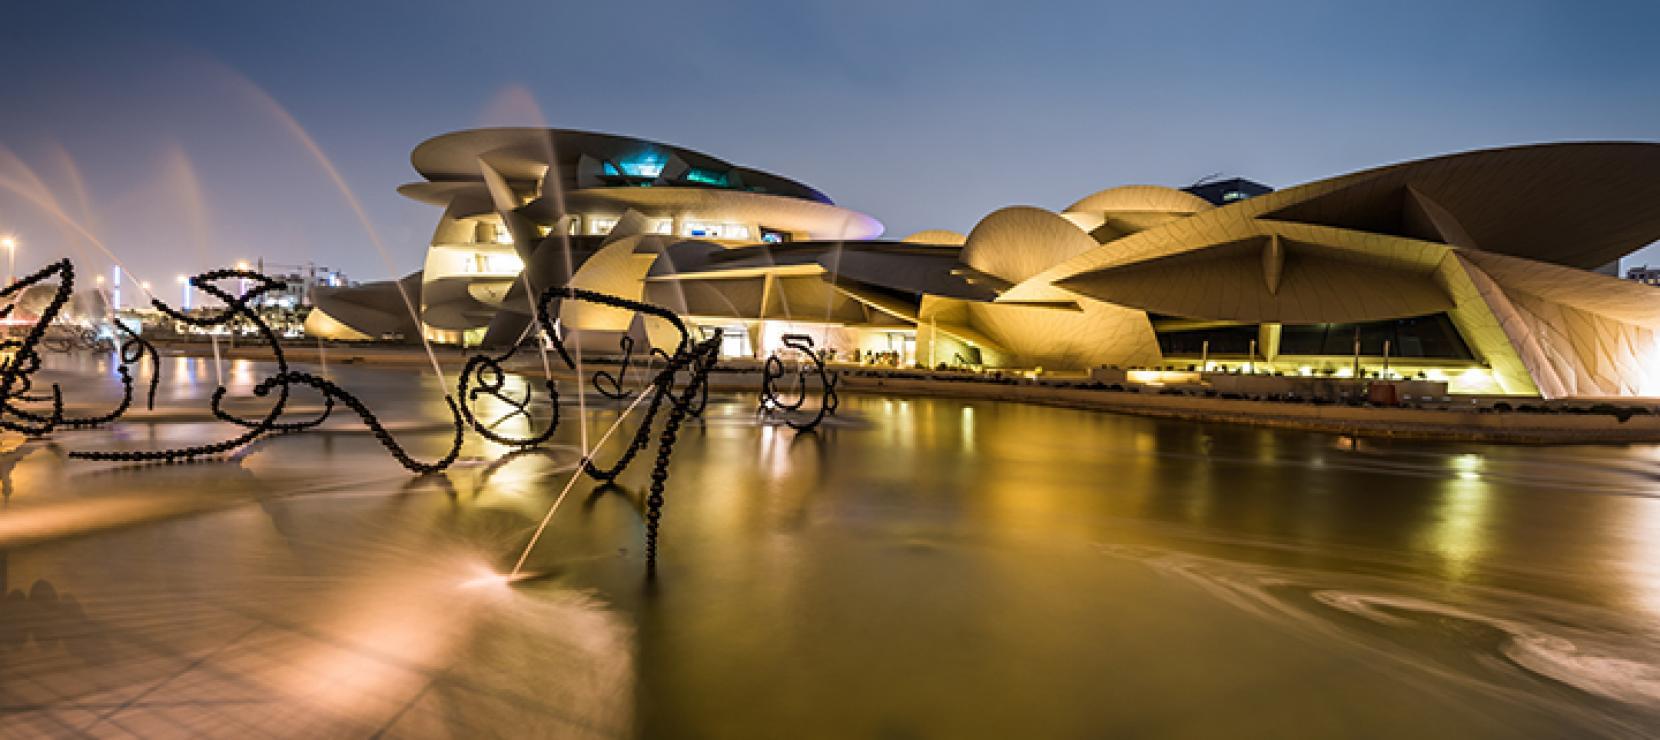 Qatar National Museum